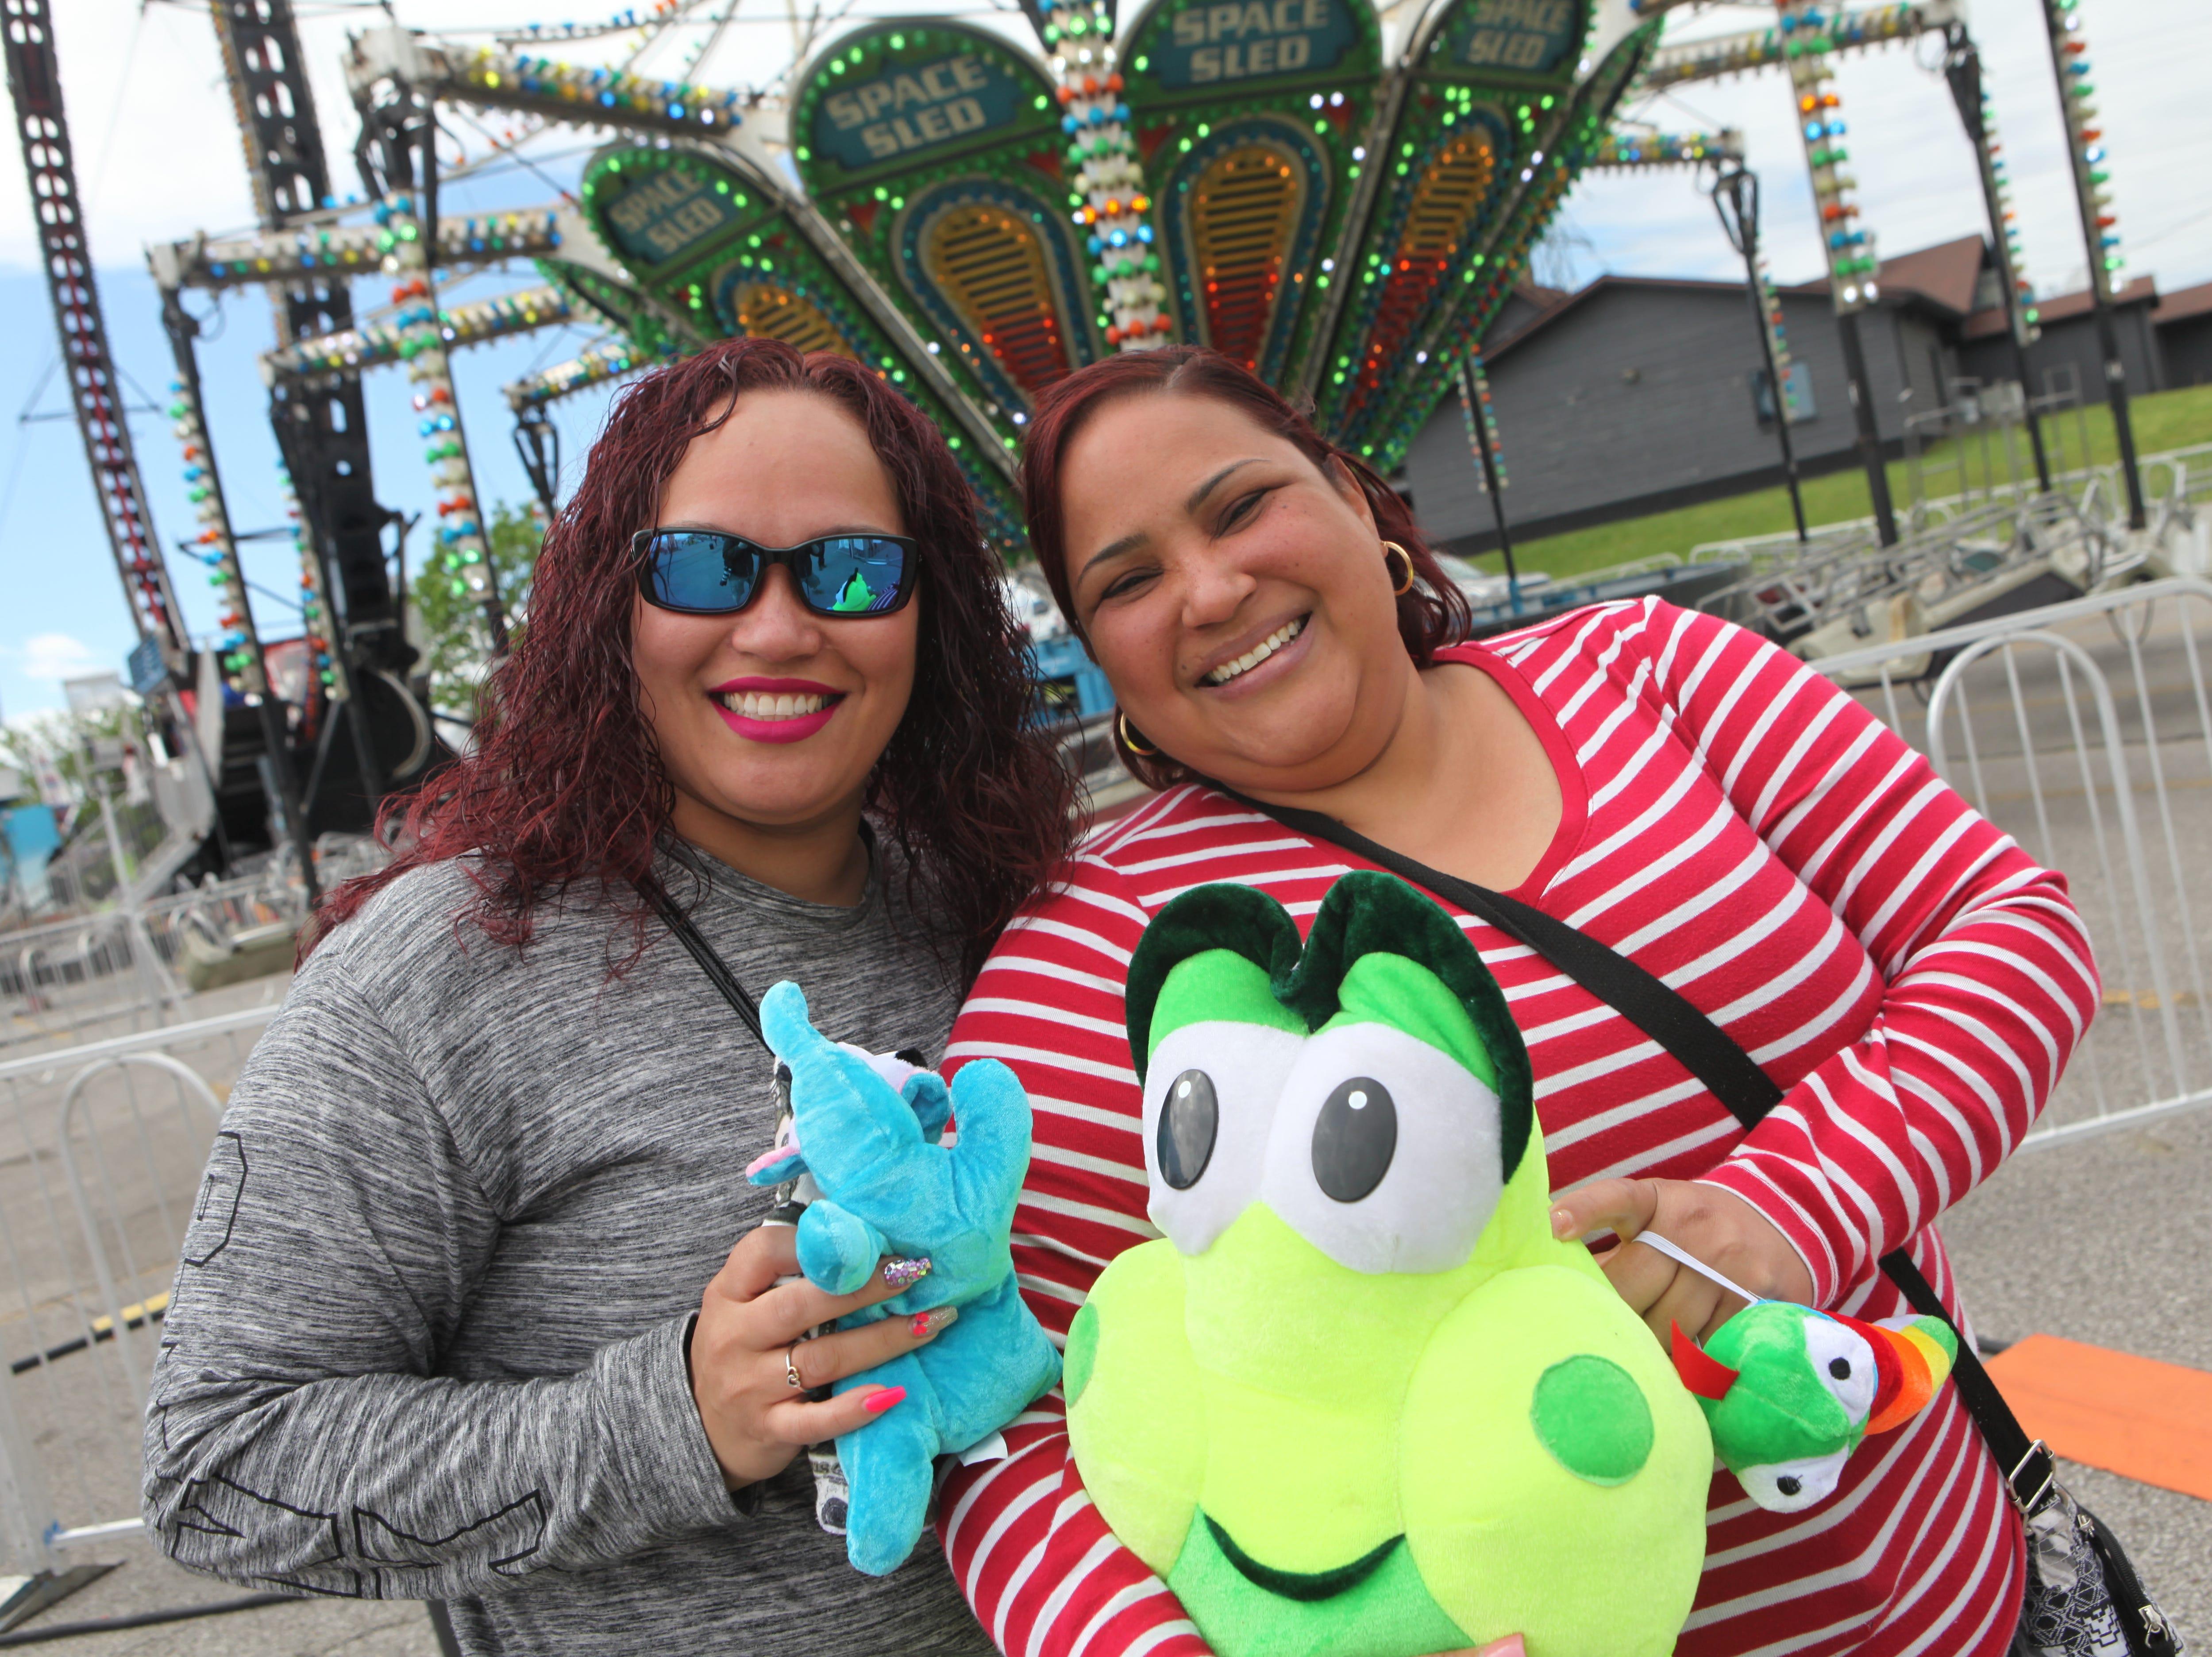 Jeslie Gonzalez and Evalisse Perez at Governor's Square Mall's Spring Carnival on Saturday, April 20, 2019.